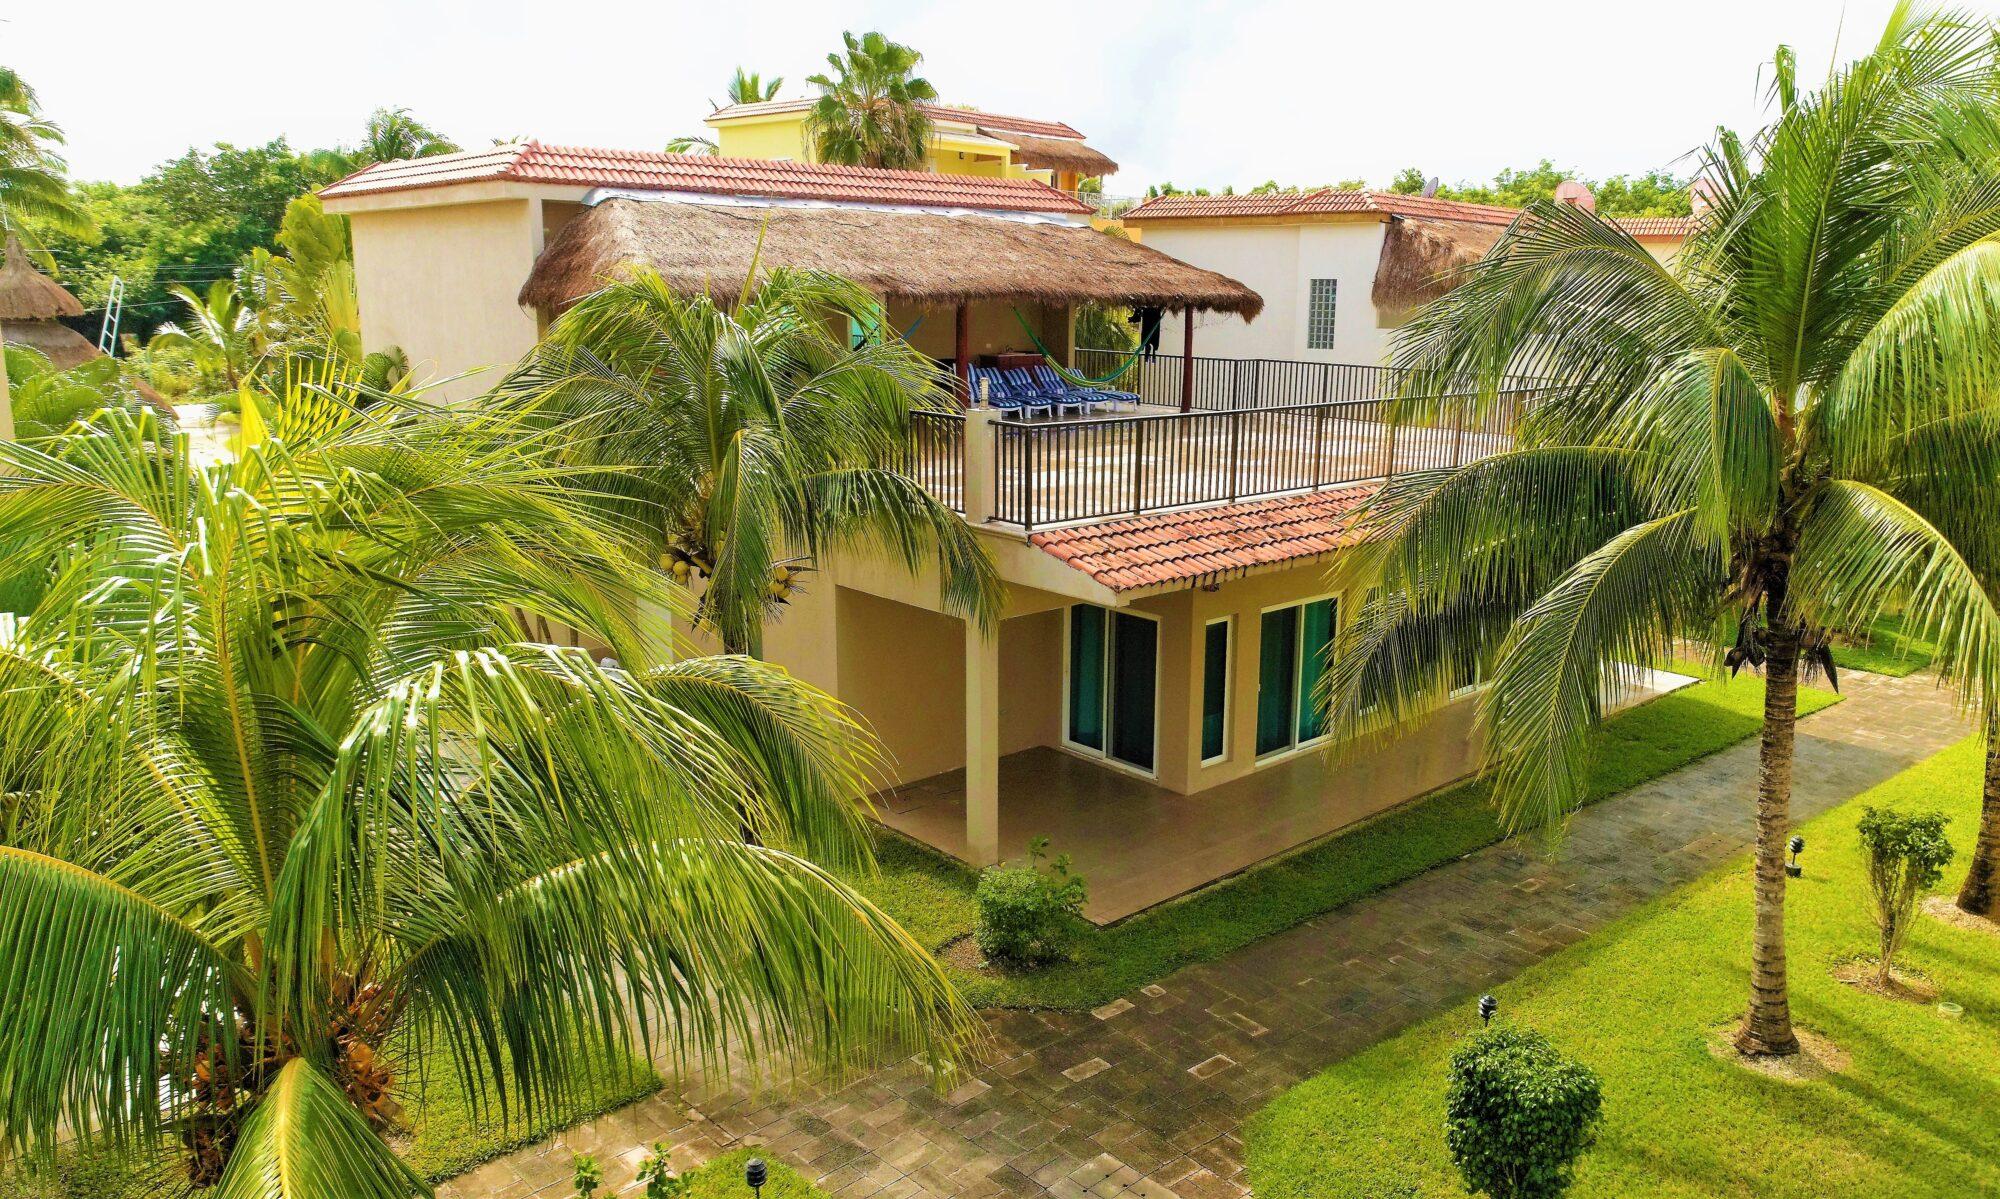 Villa Coralina Costa Del Sol Cozumel